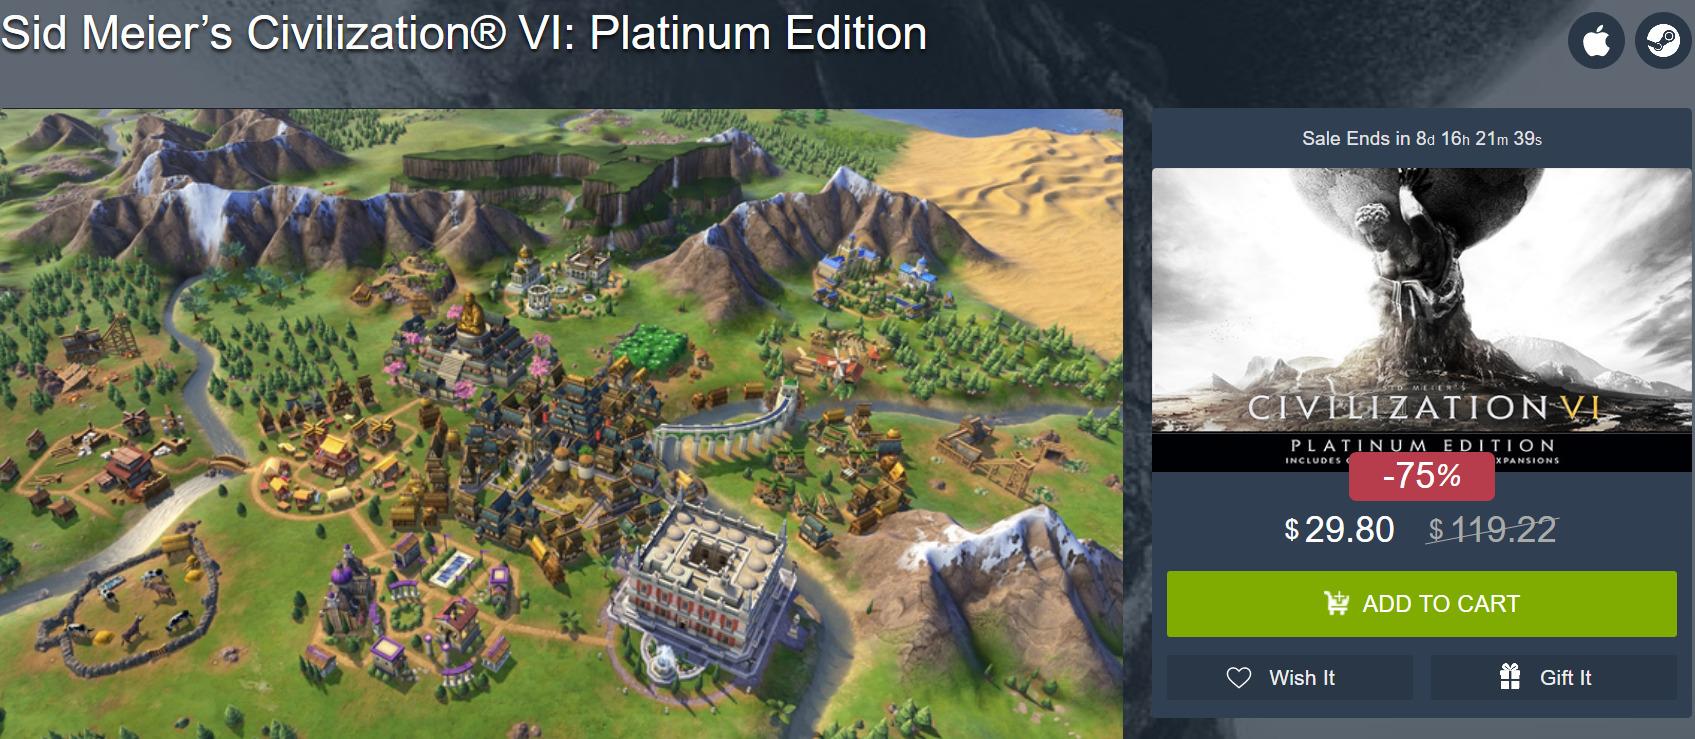 Screenshot_2019-11-29 Sid Meier's Civilization® VI Platinum Edition.jpg